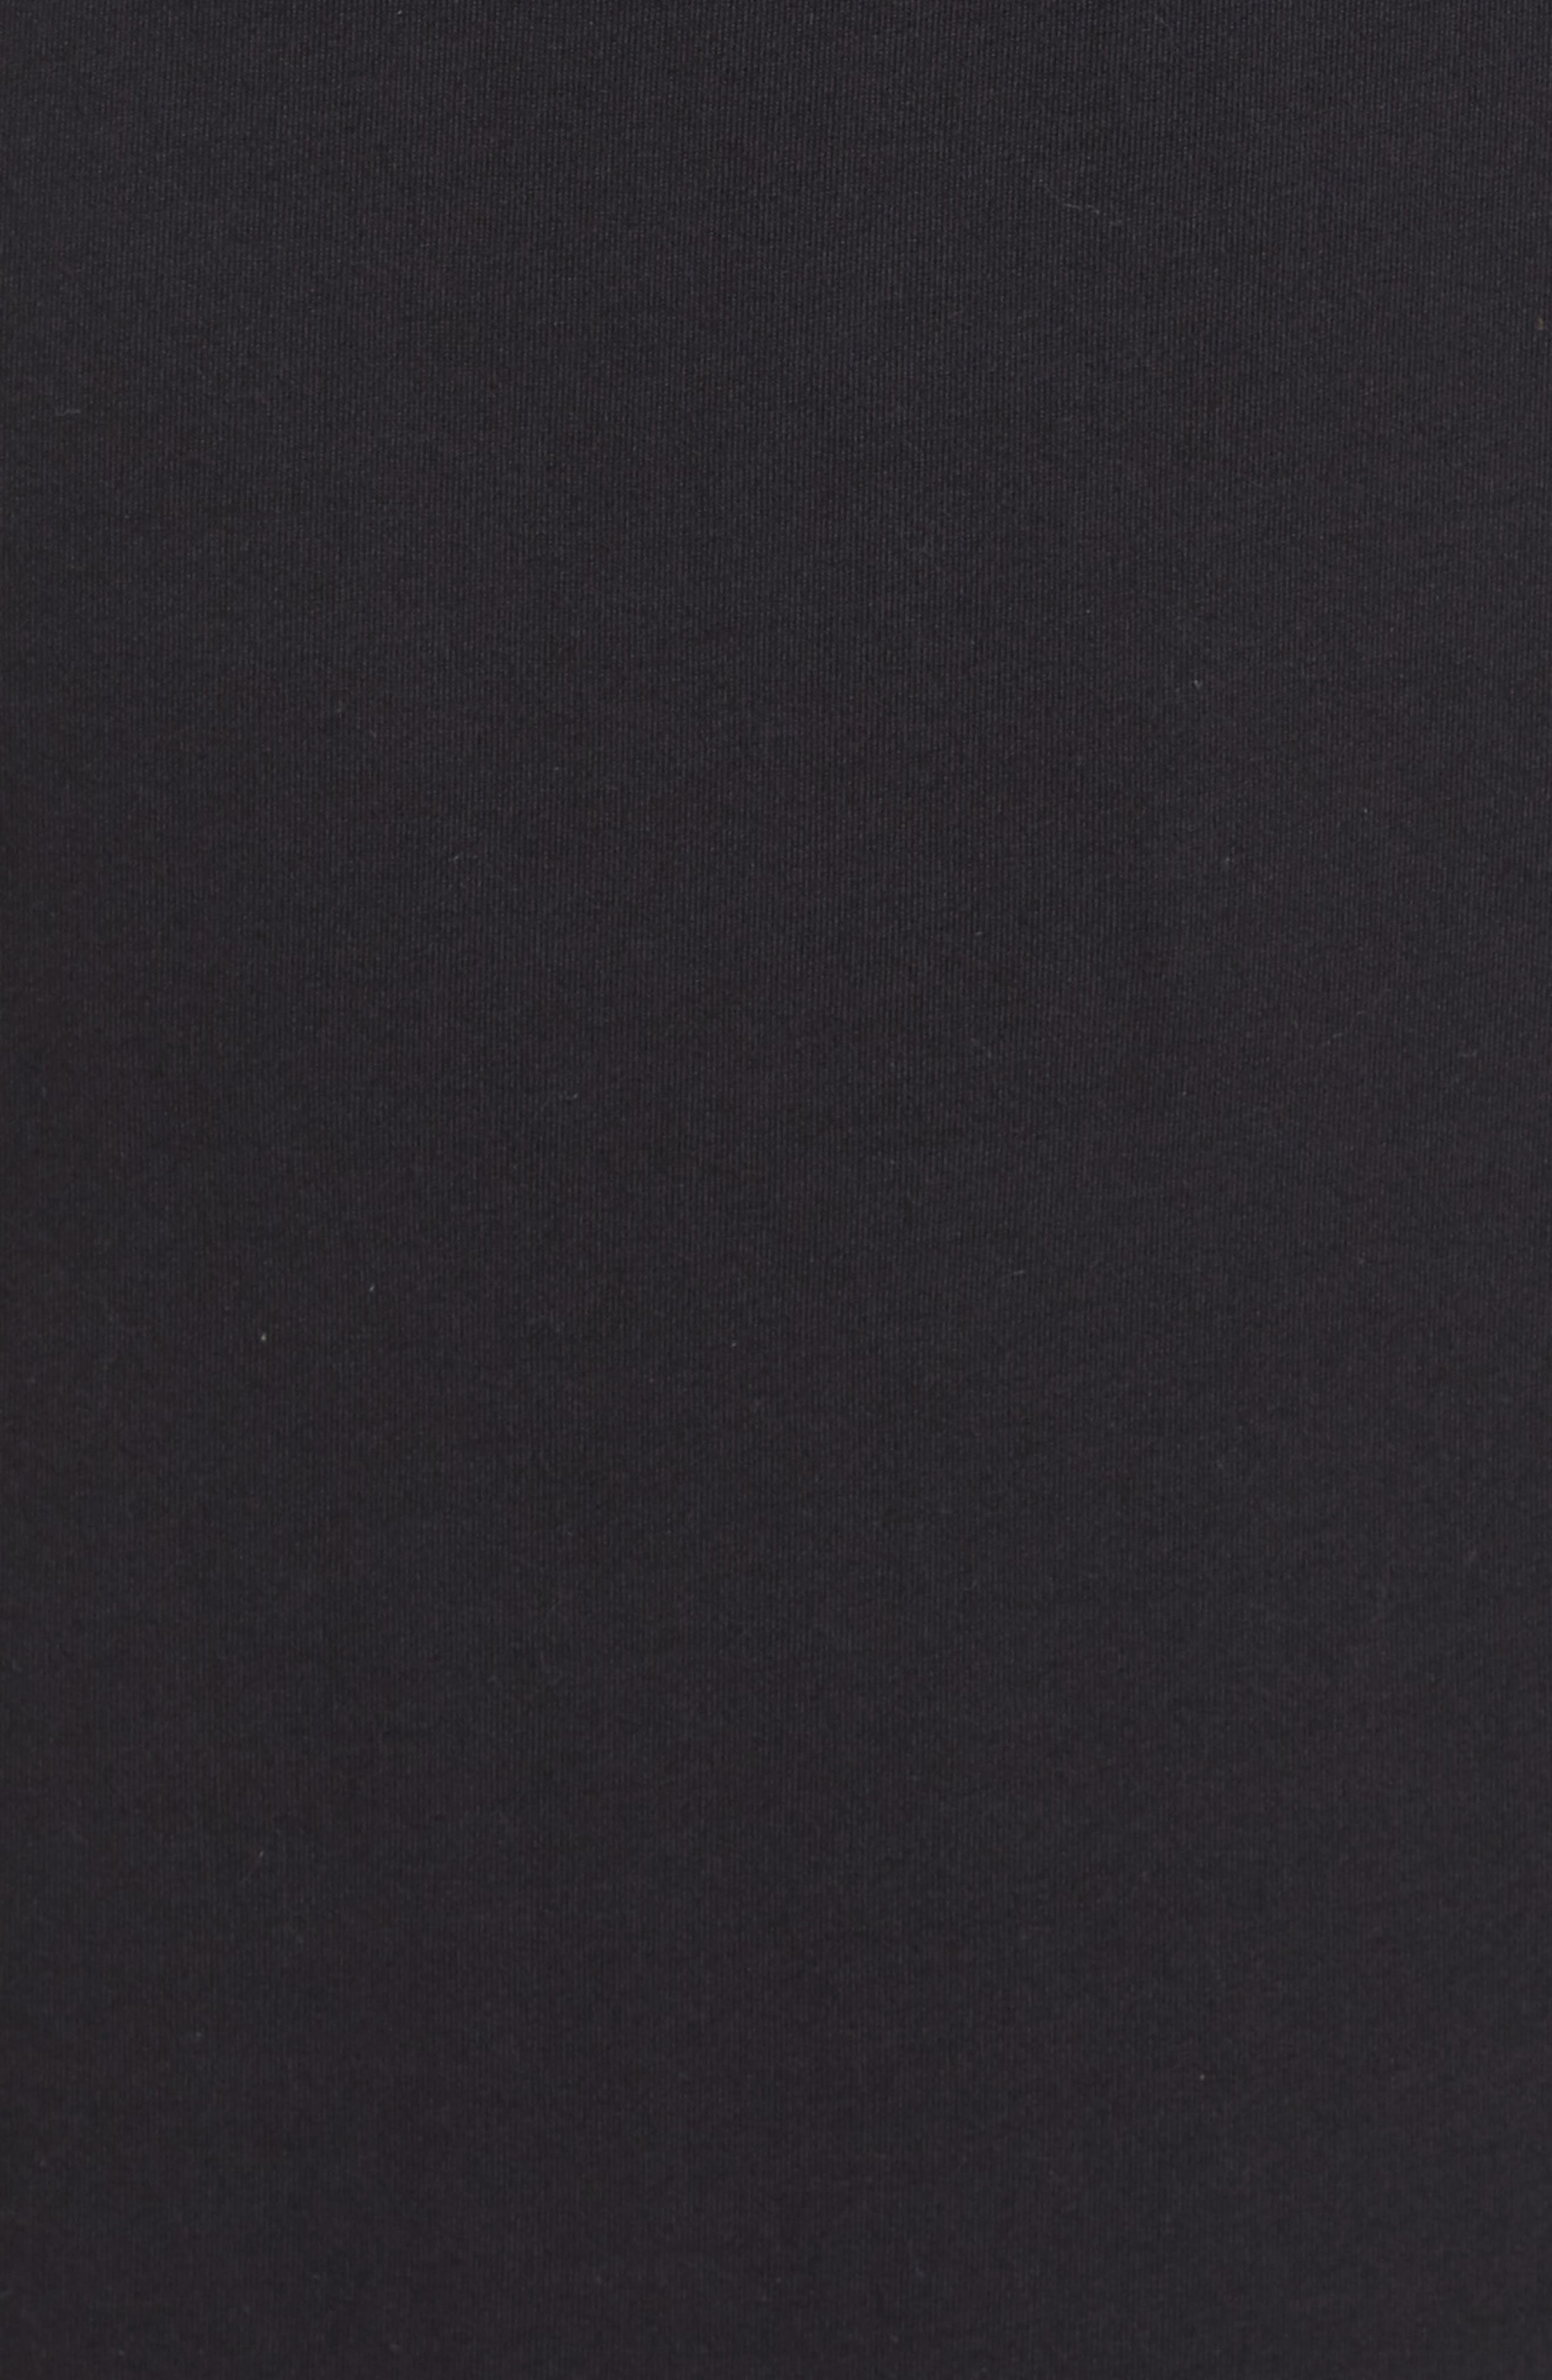 Knit Drawstring Waist Maxi Dress,                             Alternate thumbnail 4, color,                             BLACK